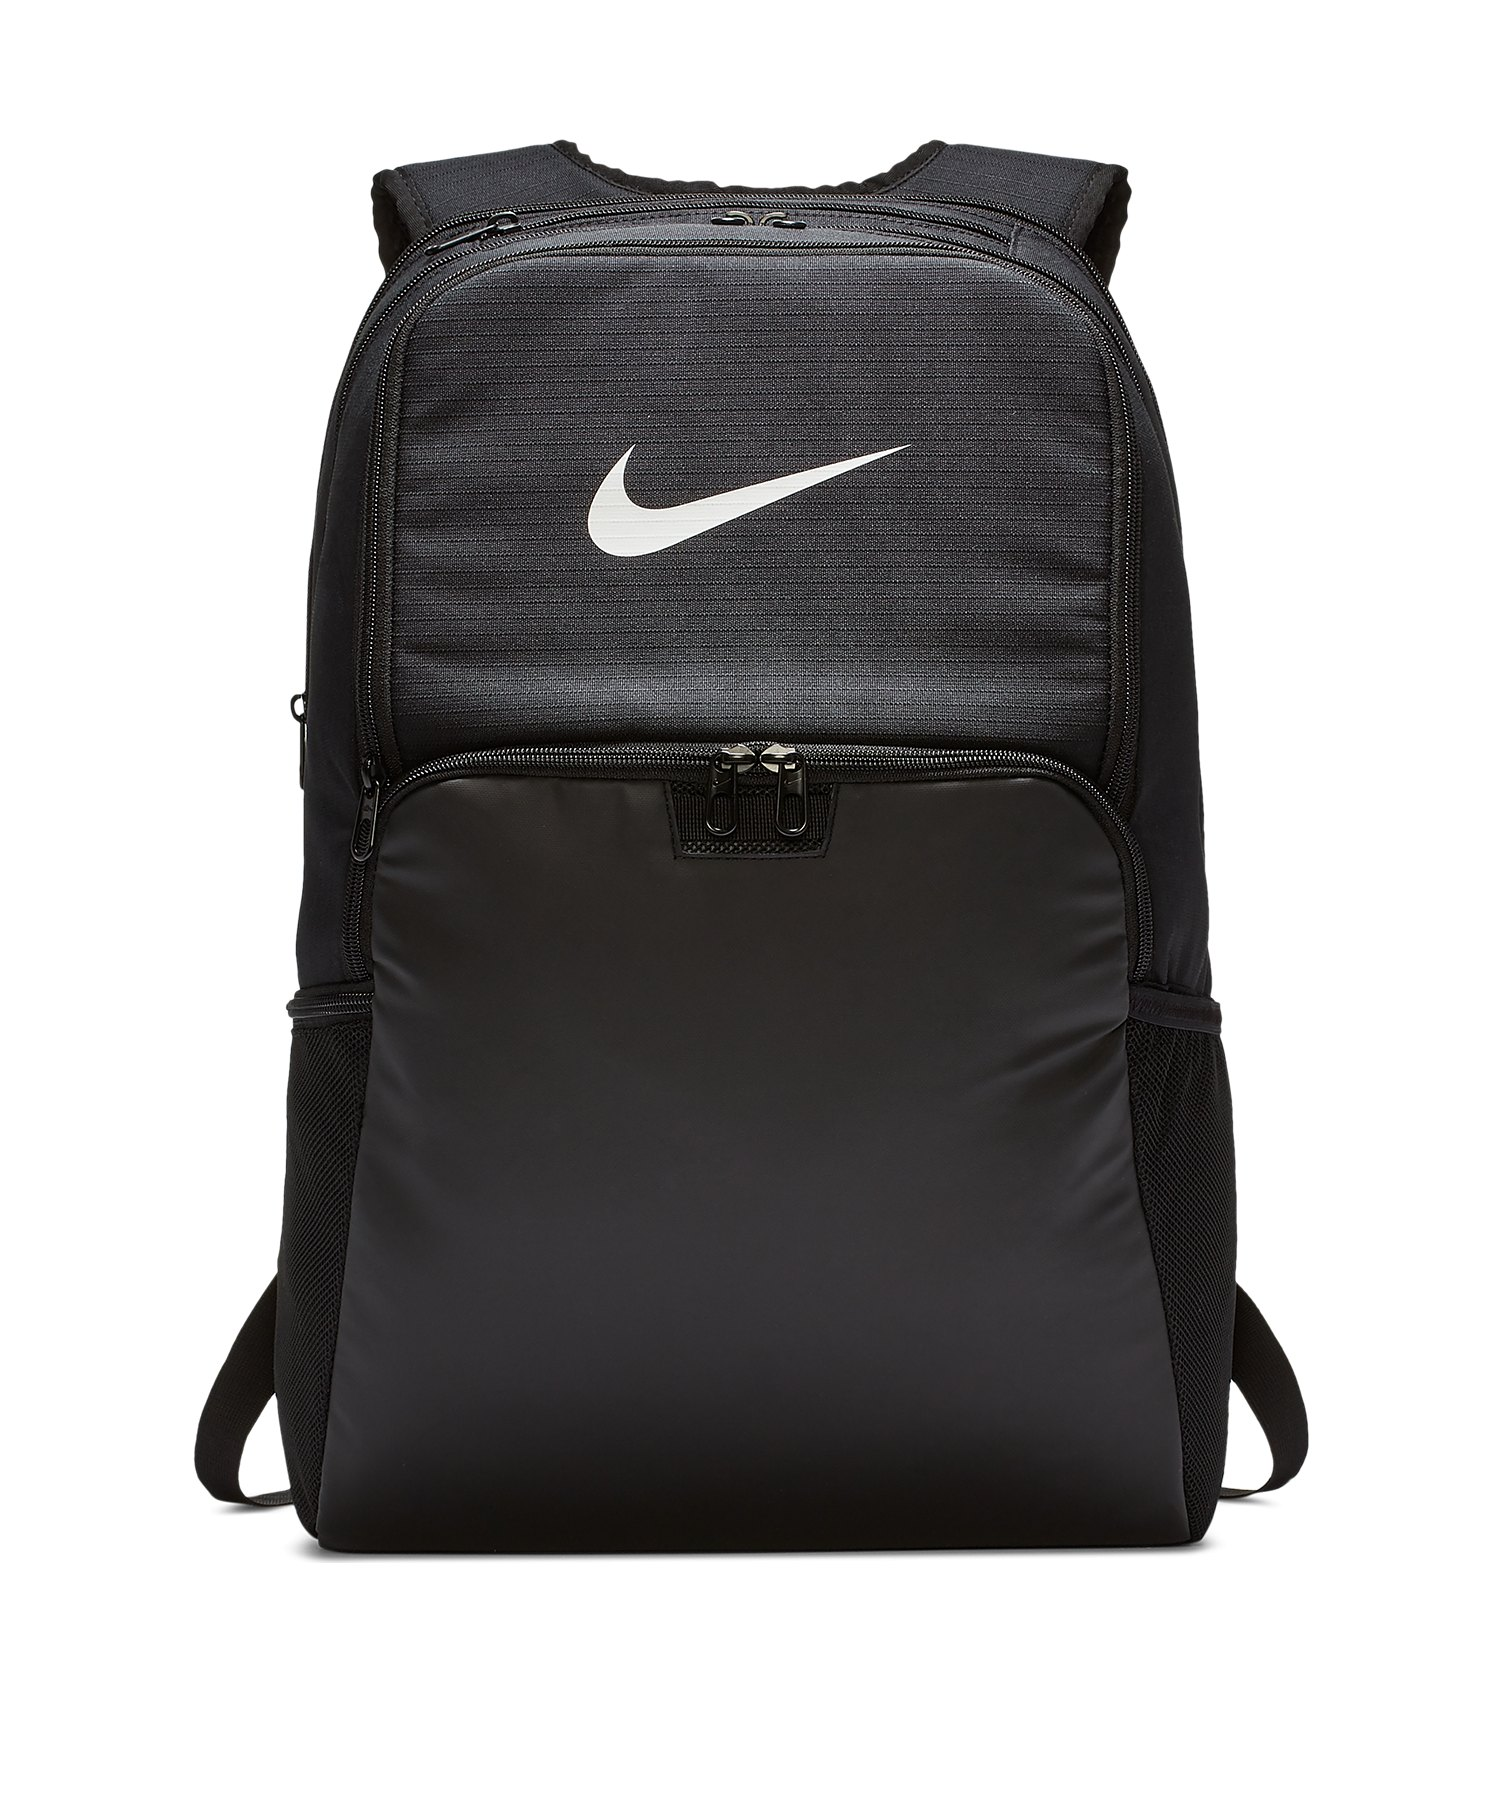 Nike Brasilia 9.0 Backpack Rucksack Schwarz F010 - schwarz